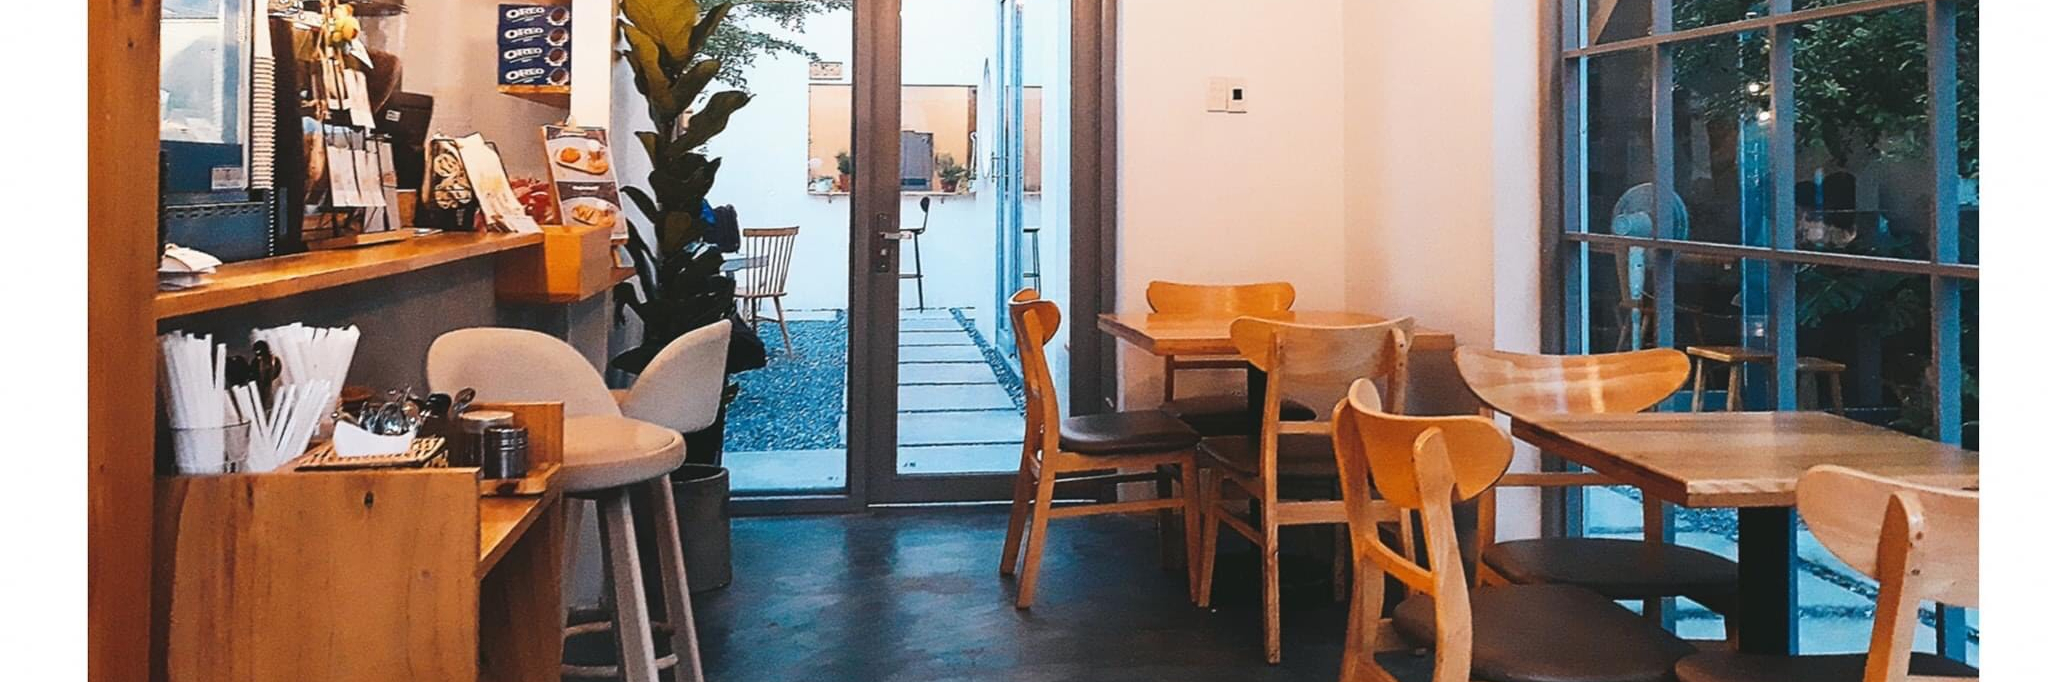 https://gody.vn/blog/congchua_mauhong803174/post/ibasho-coffee-and-hostel-da-nang-9095